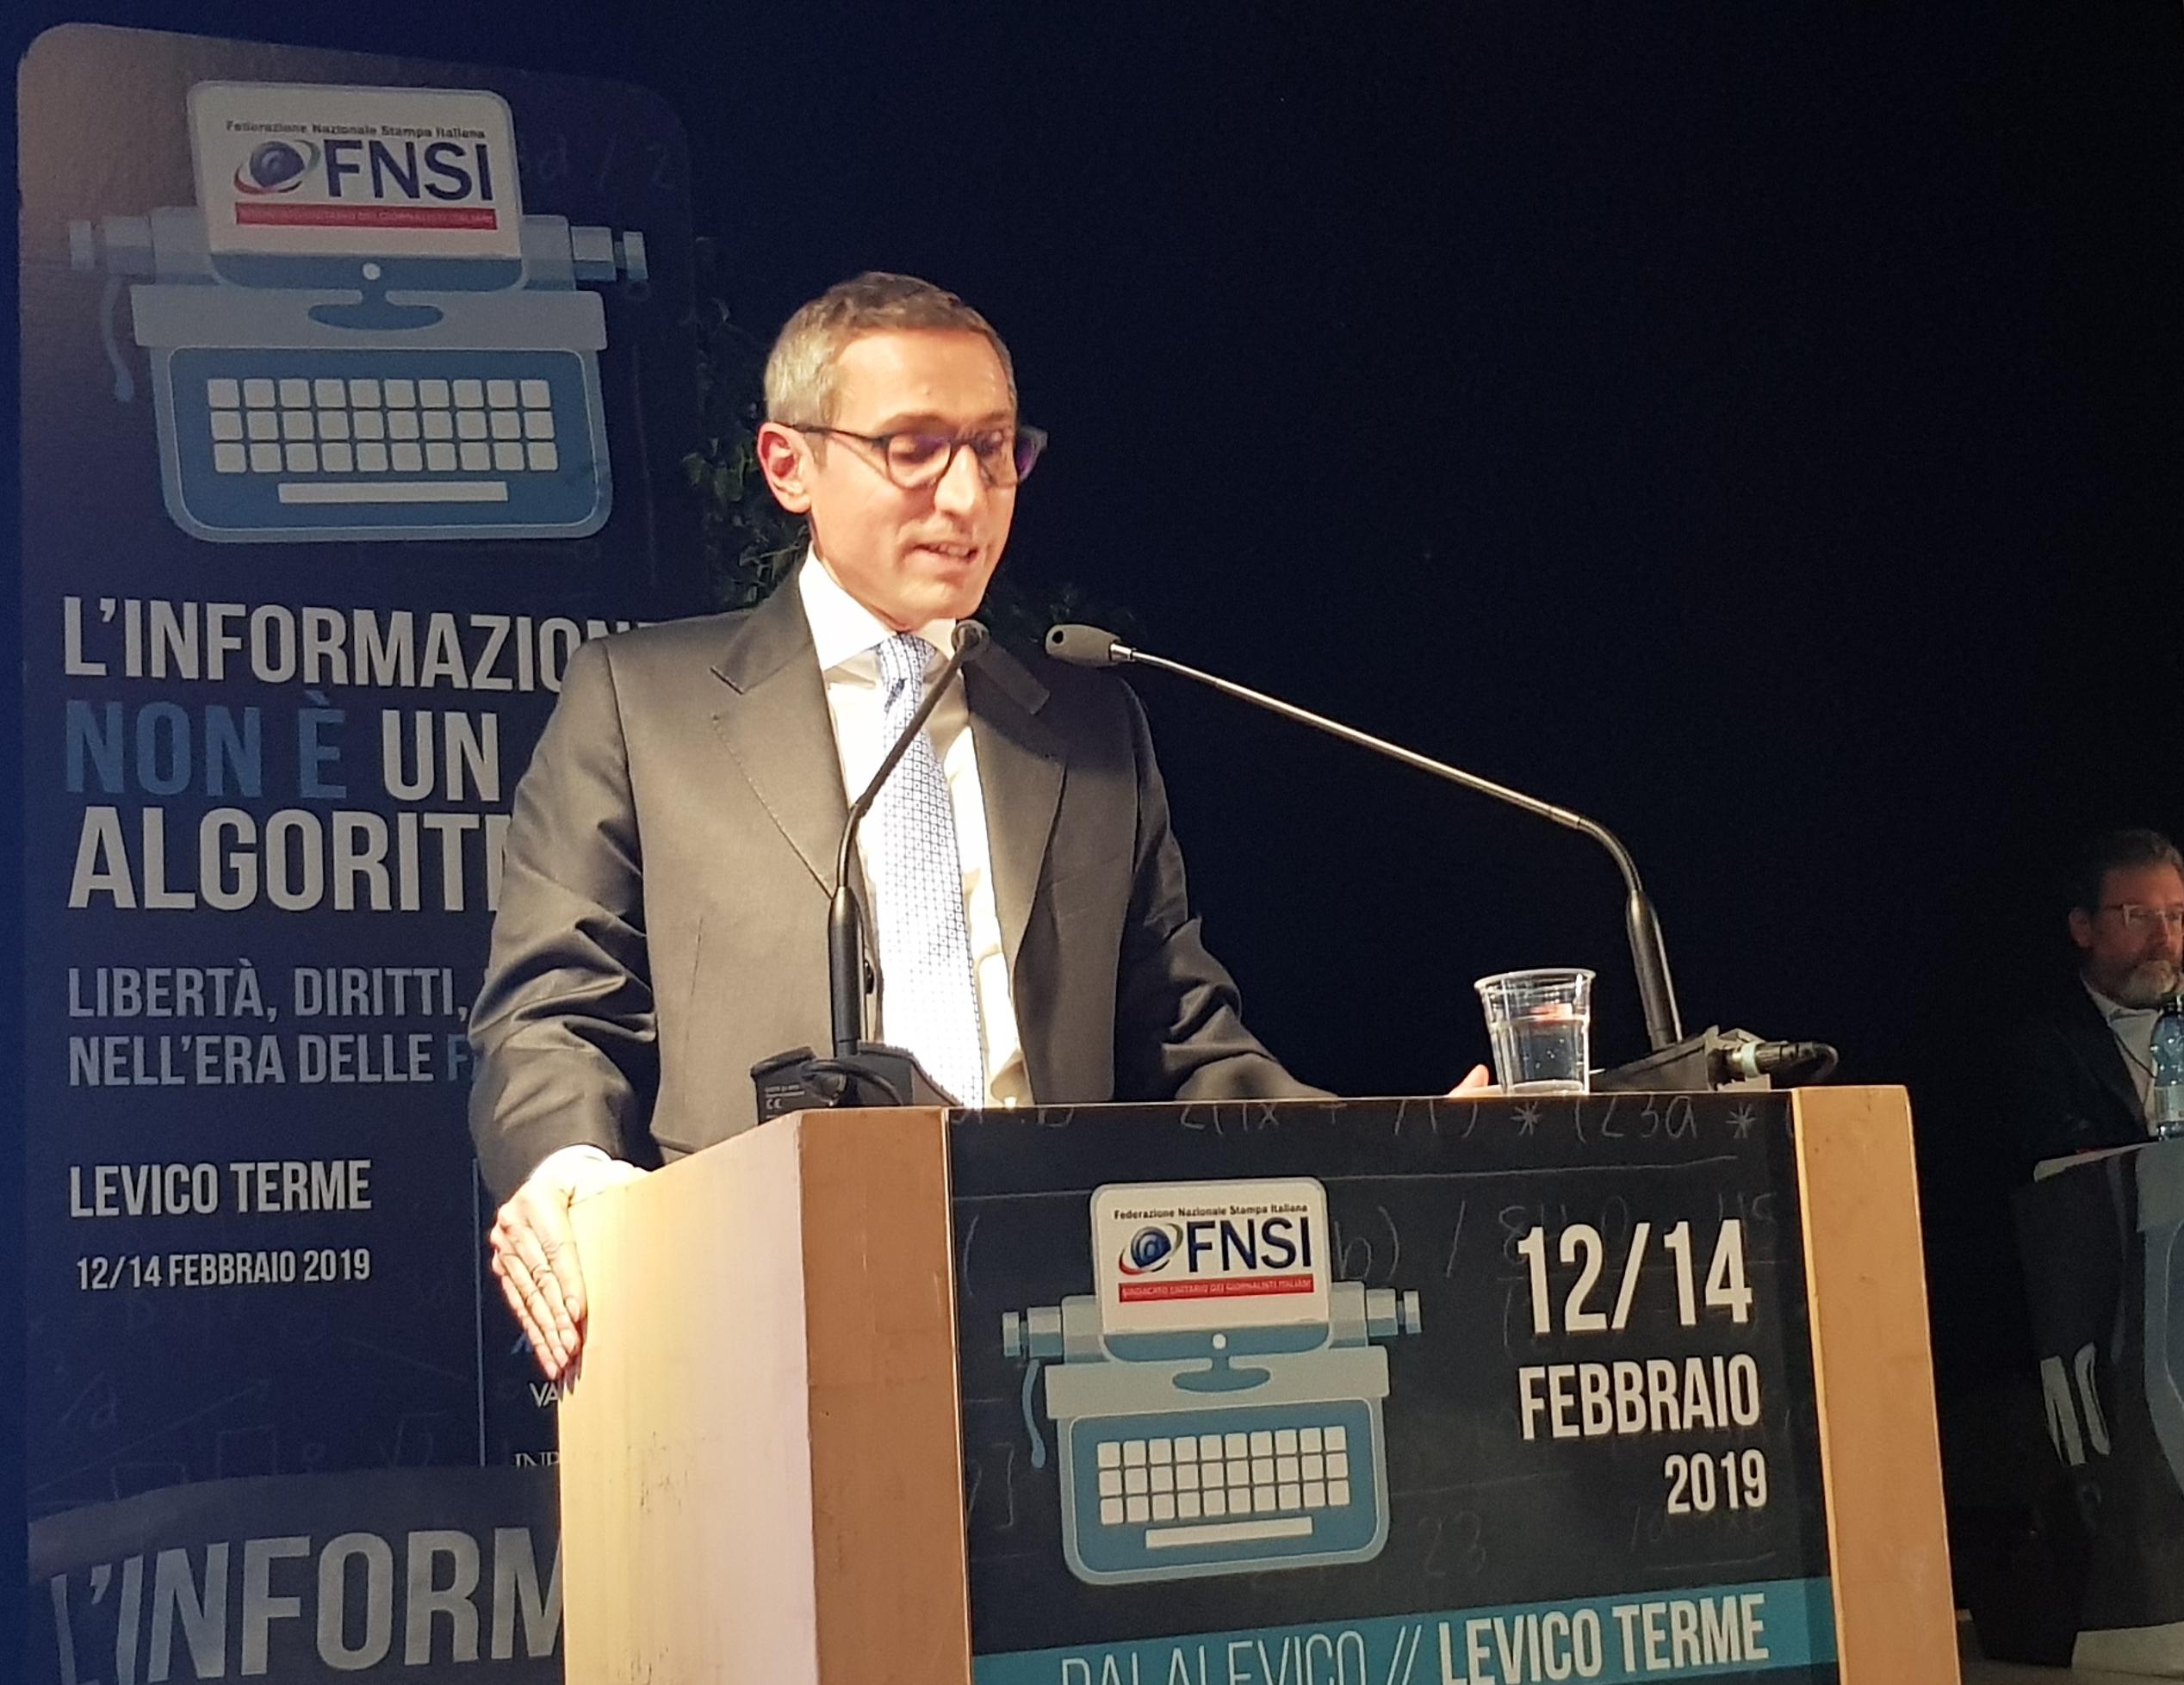 Raffaele Lorusso segretario generale Fnsi